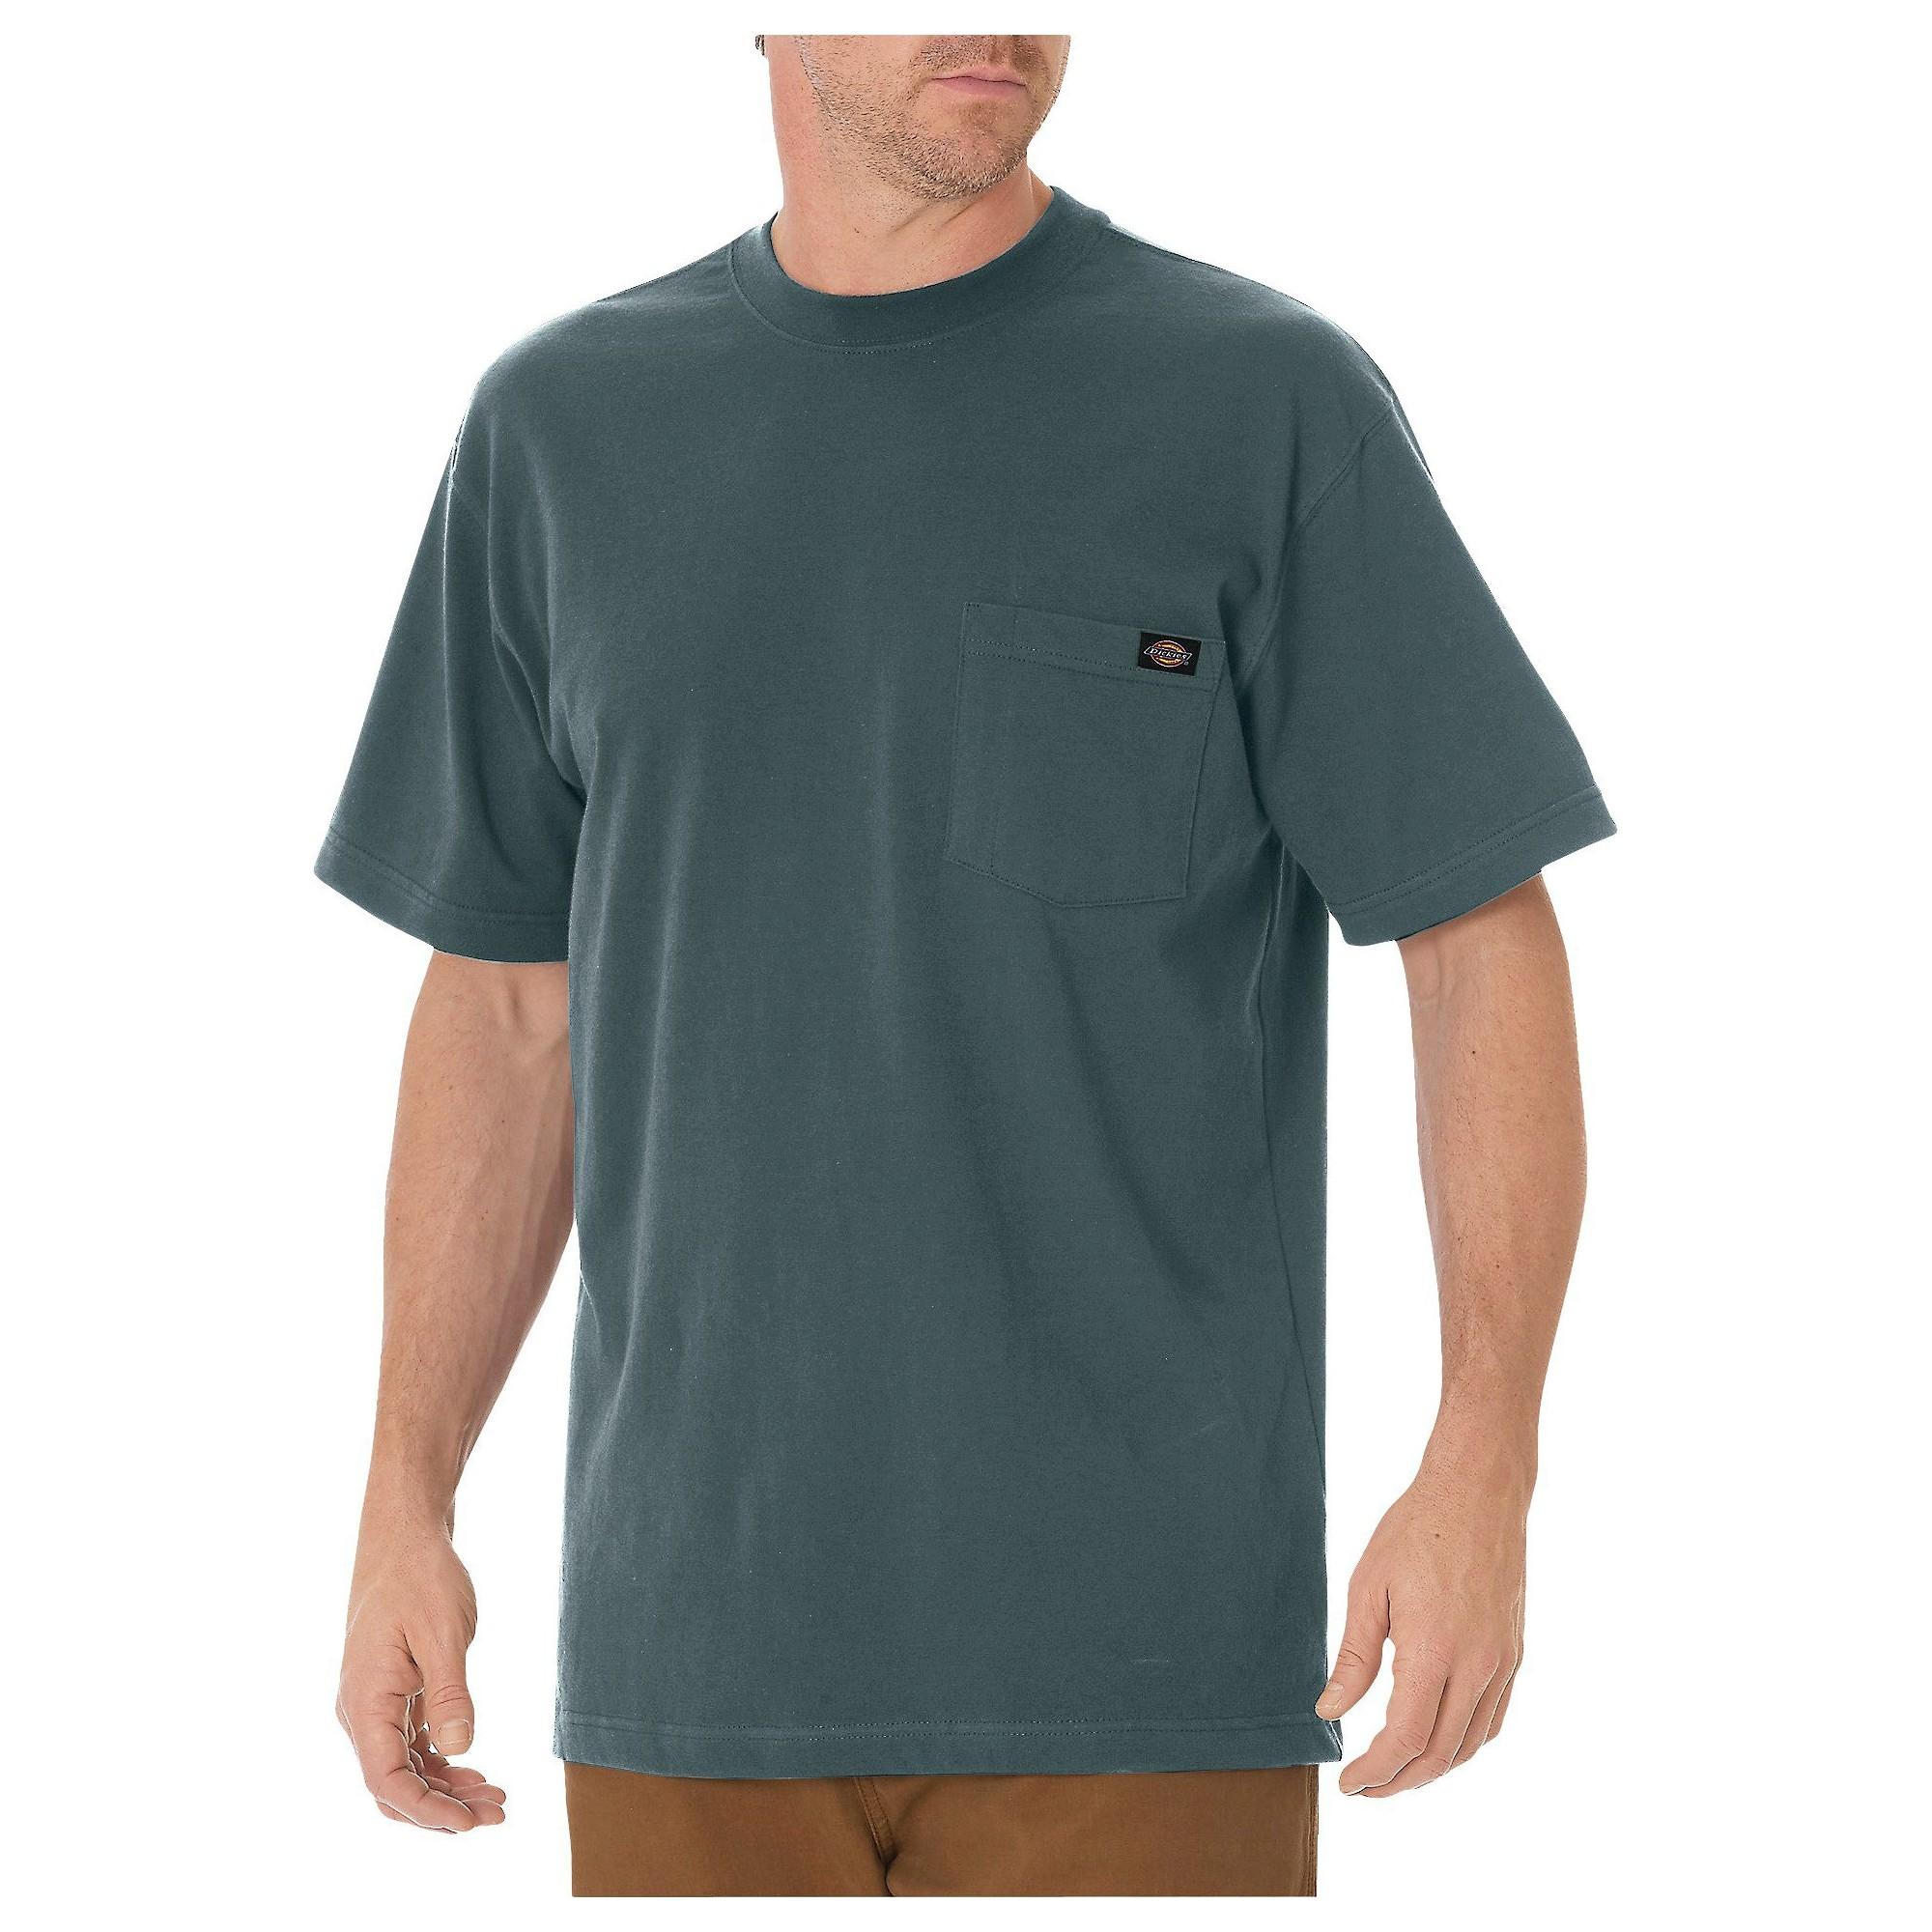 a1e36c276d Dickies Men s Big   Tall Cotton Heavyweight Short Sleeve Pocket T-Shirt-  Lincoln Green L Tall